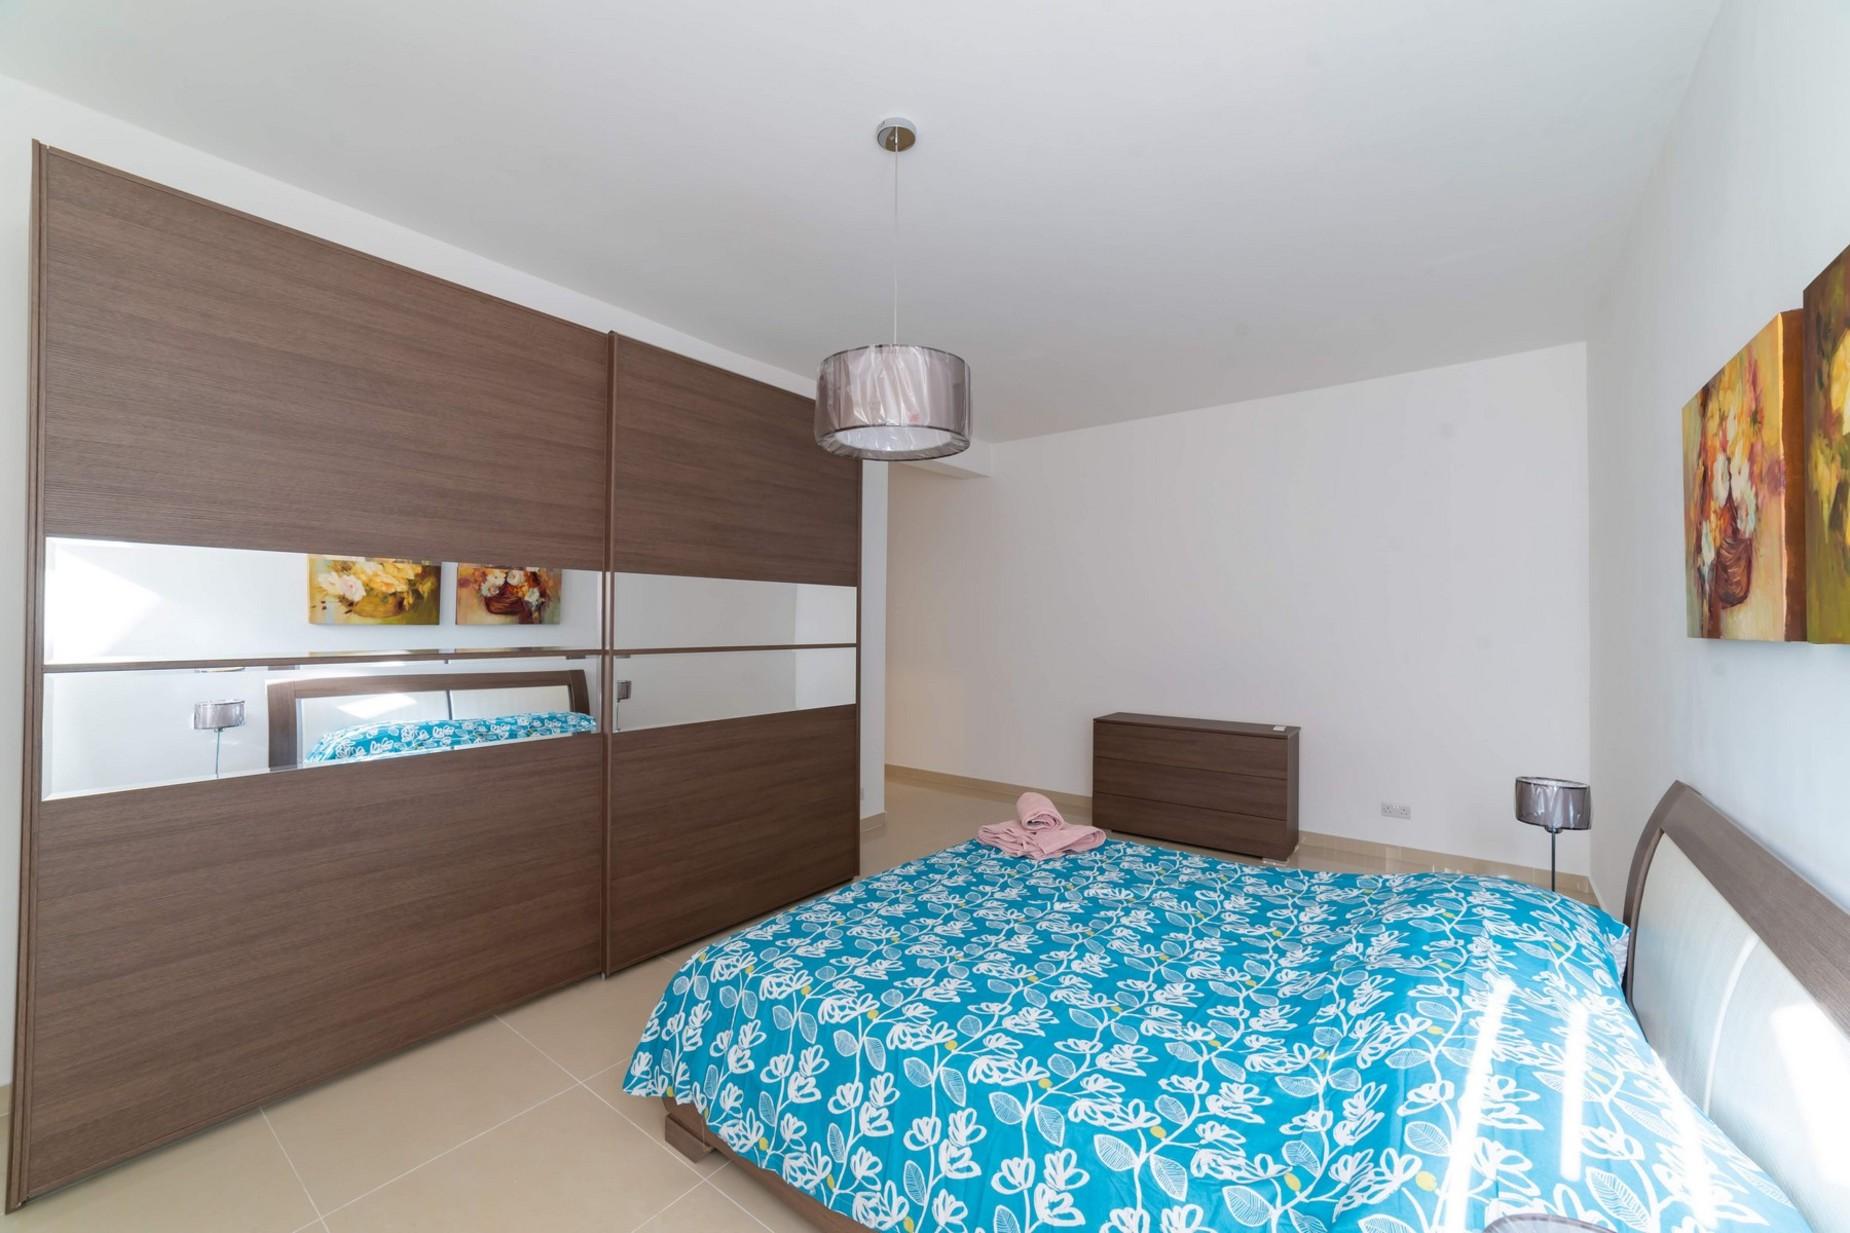 3 bed Apartment For Rent in Balzan, Balzan - thumb 9